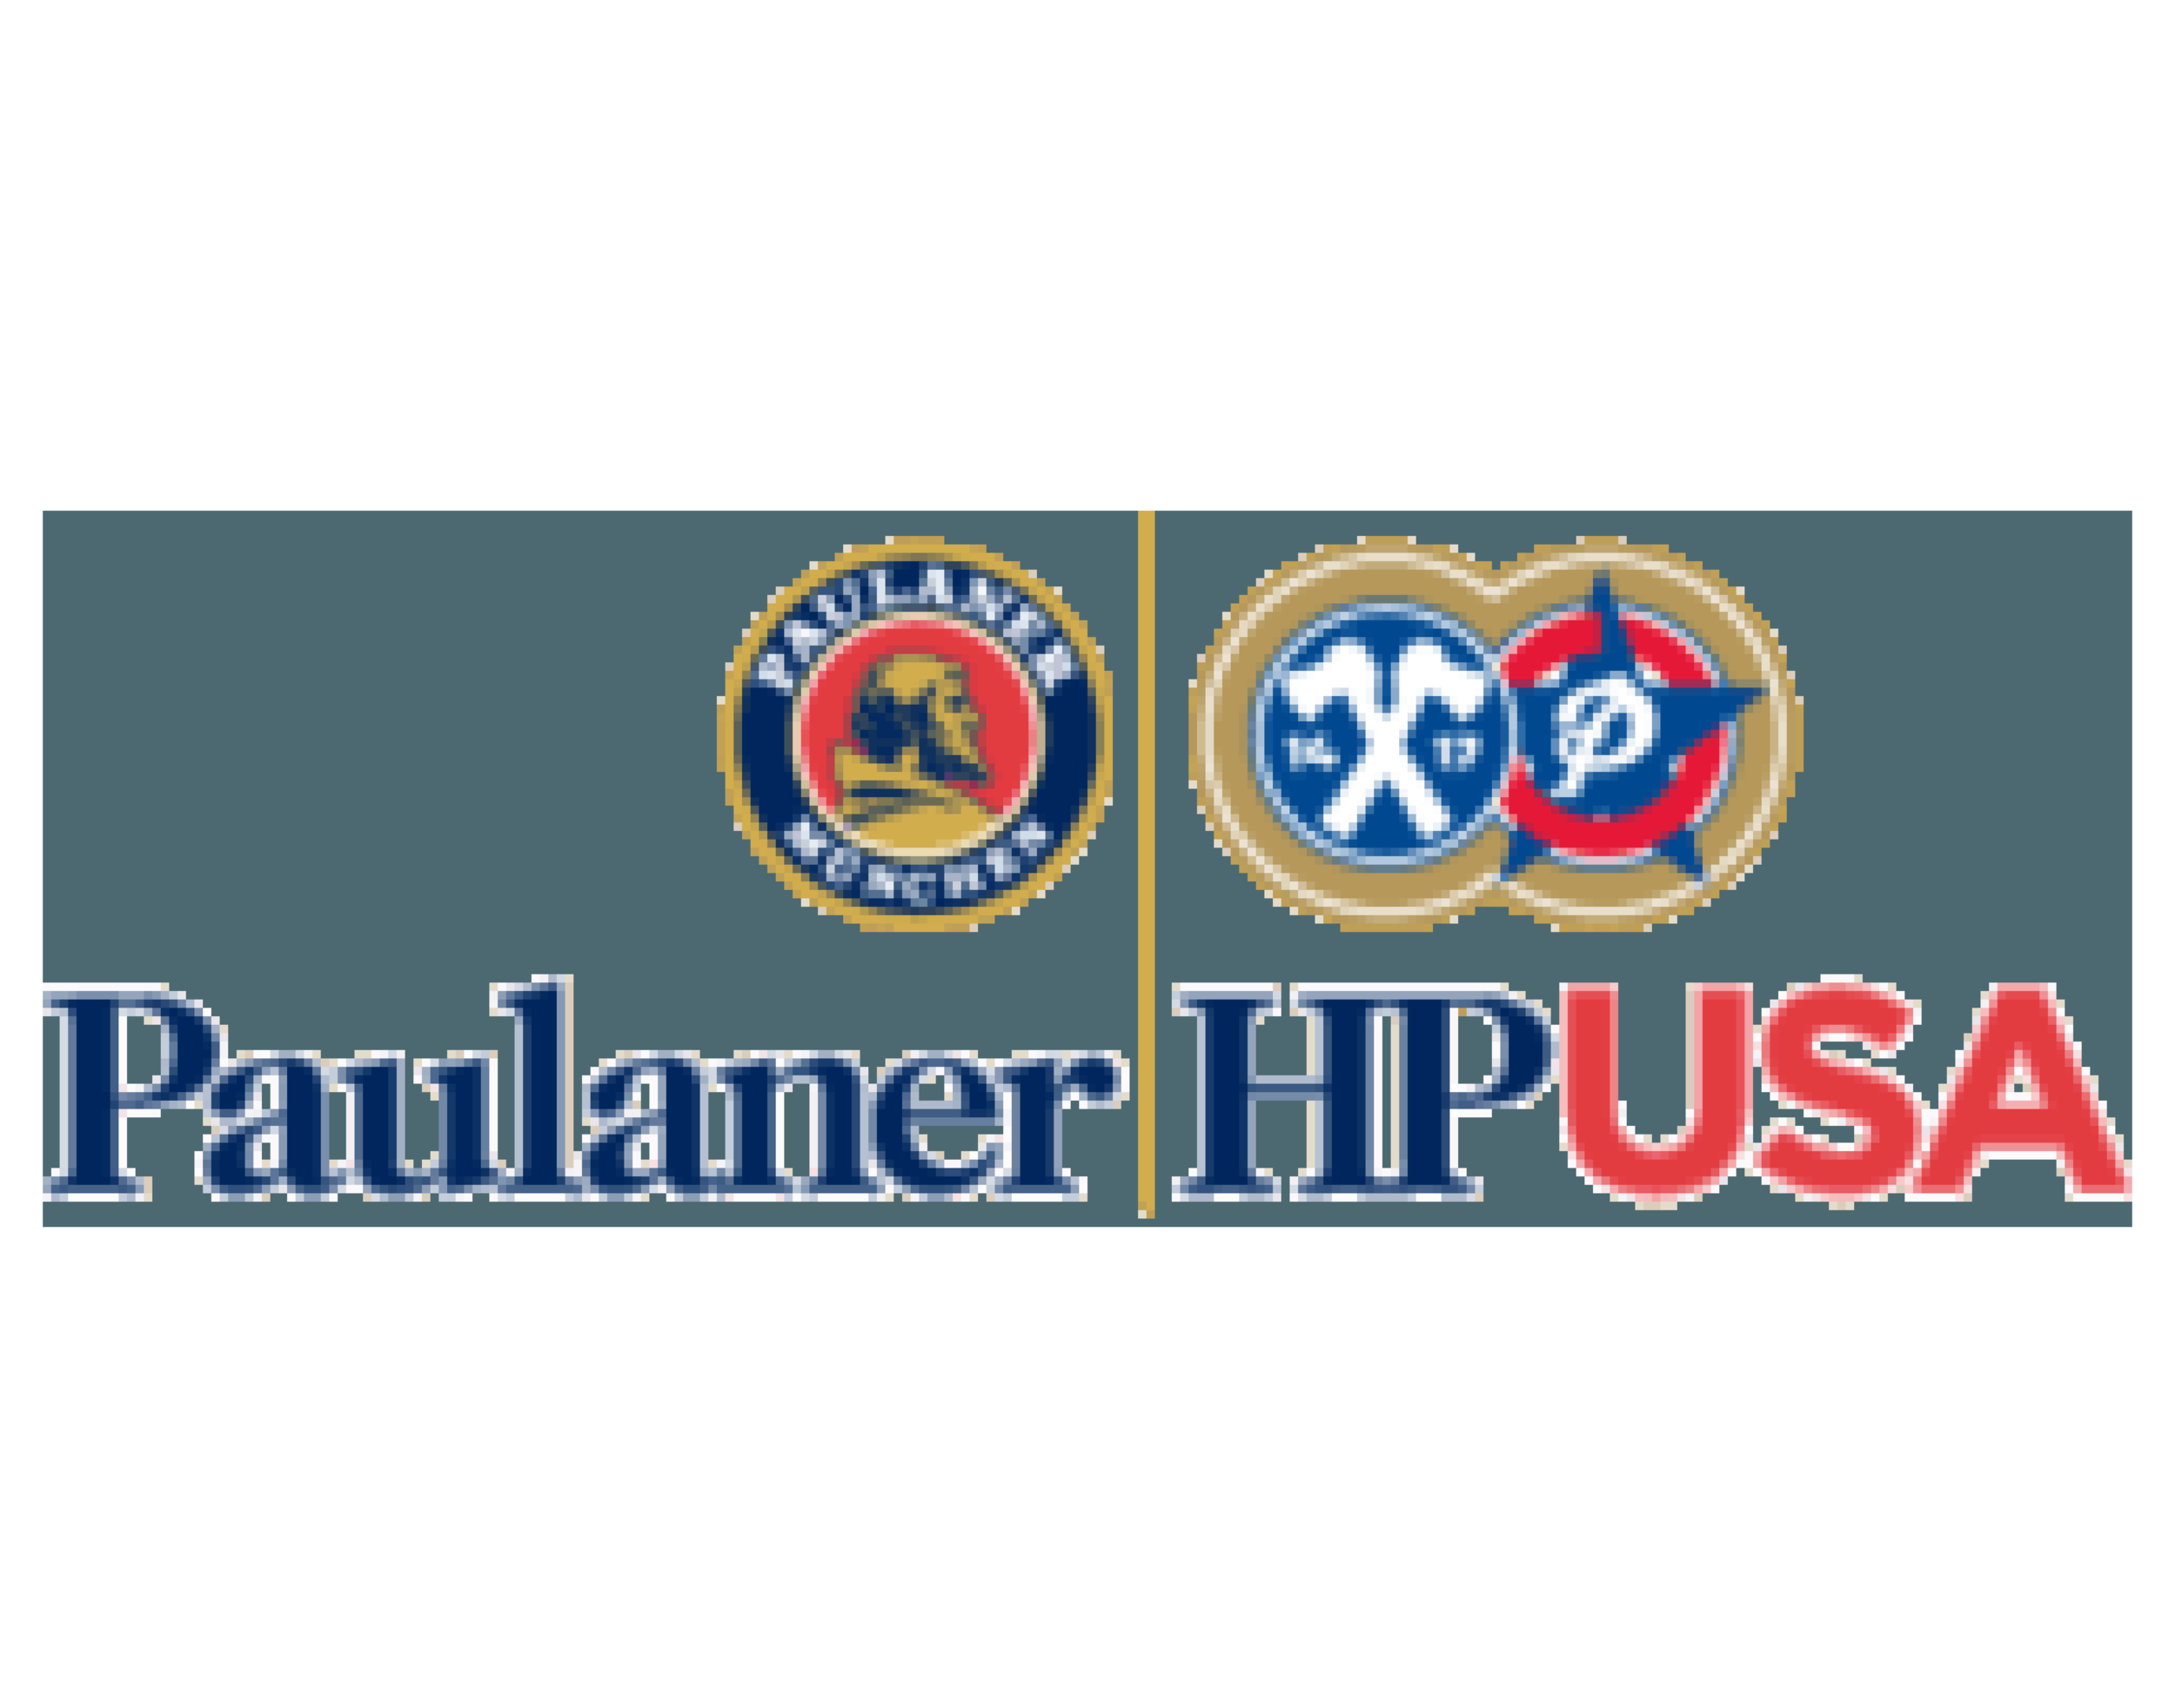 Paulaner HP logo. Links to Paulaner HP website.